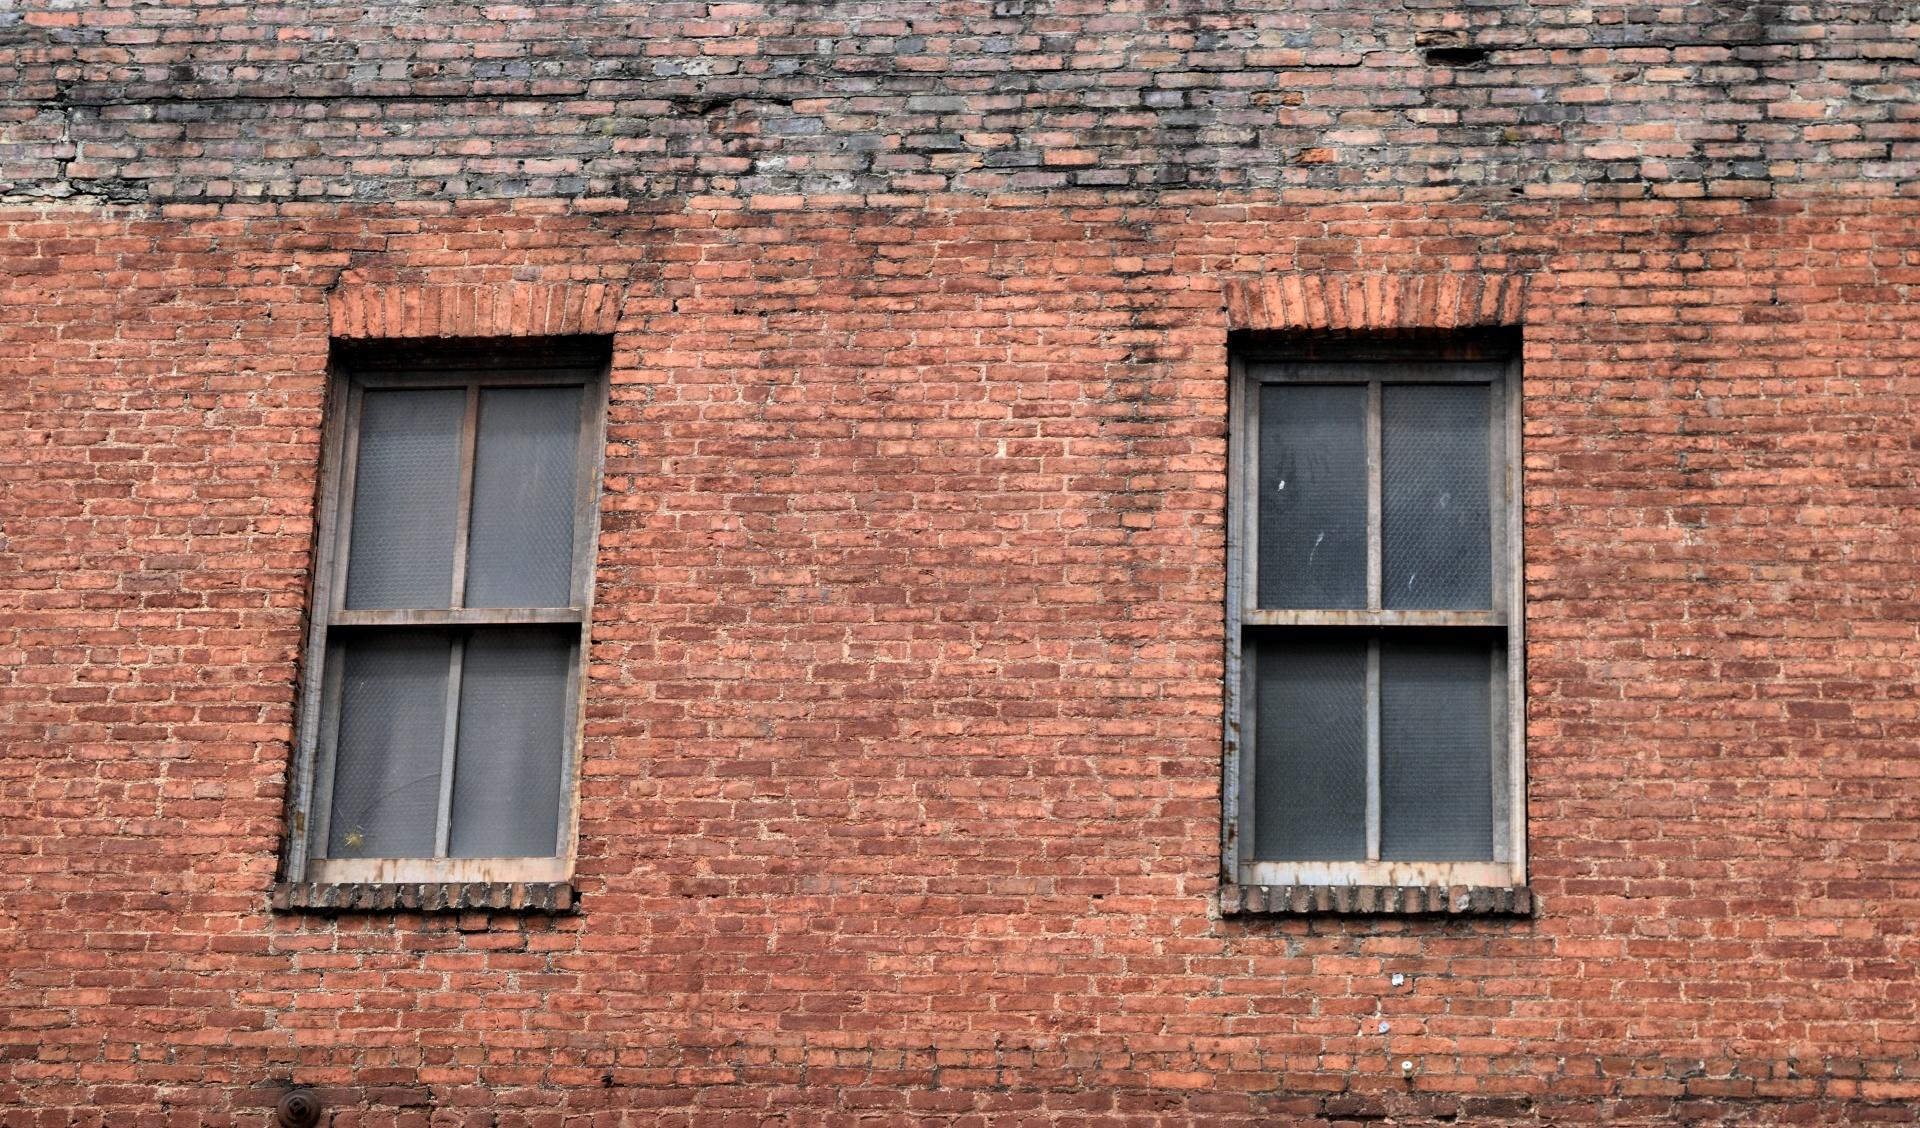 Fullsize Of Red Brick Wall